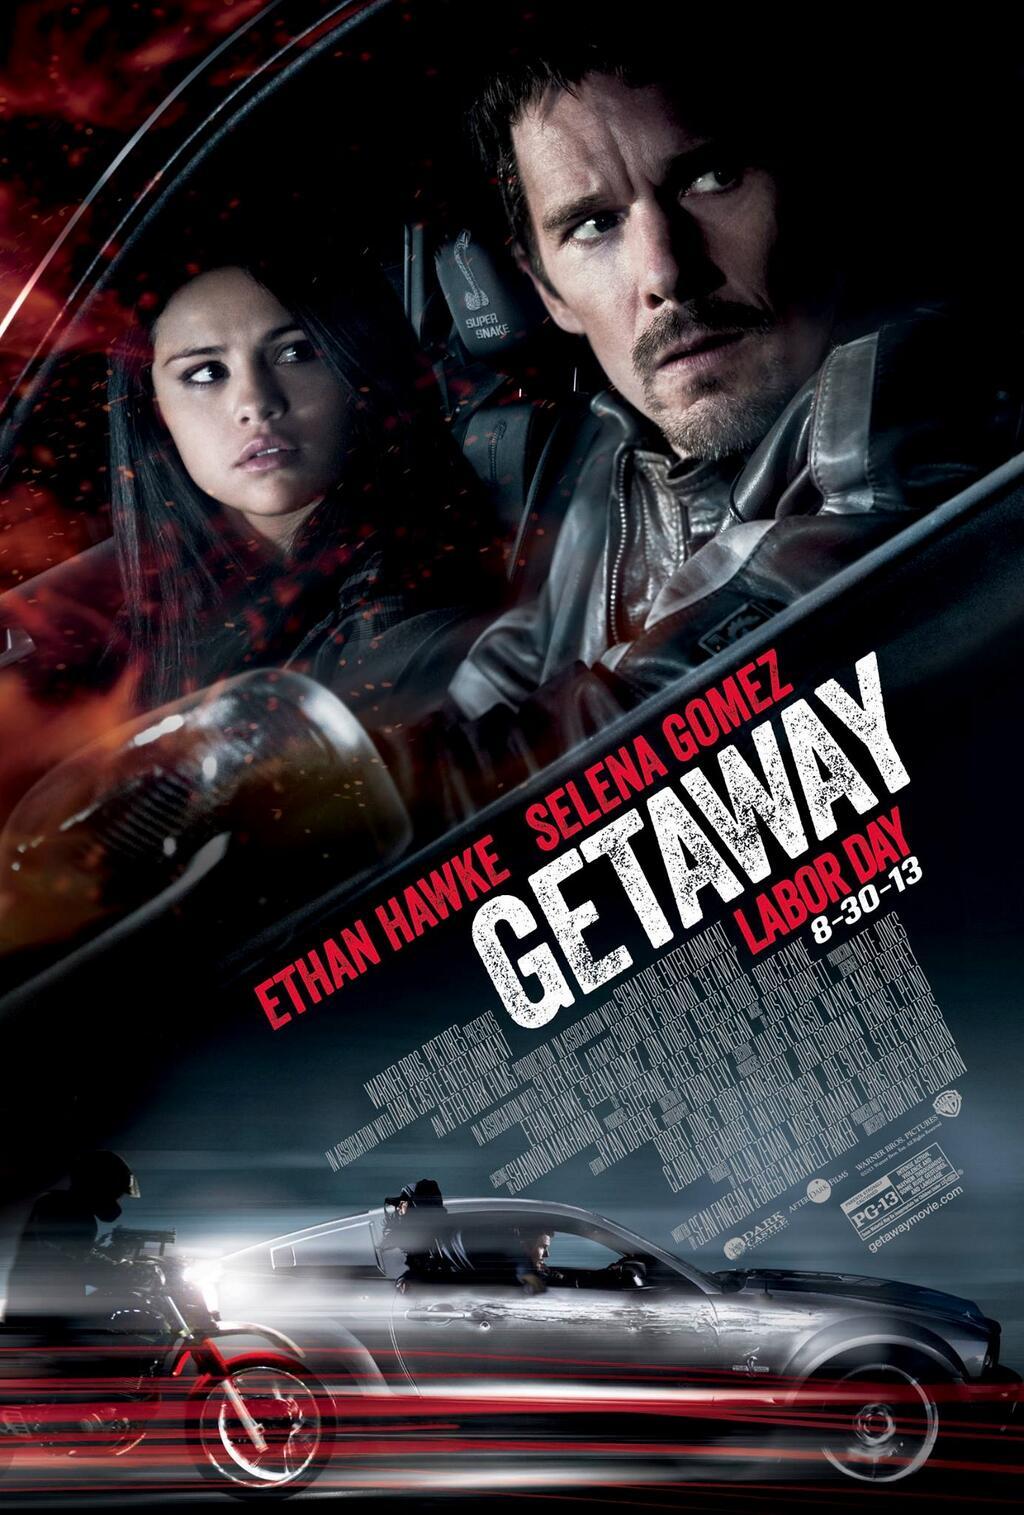 Getaway - Poster - 003